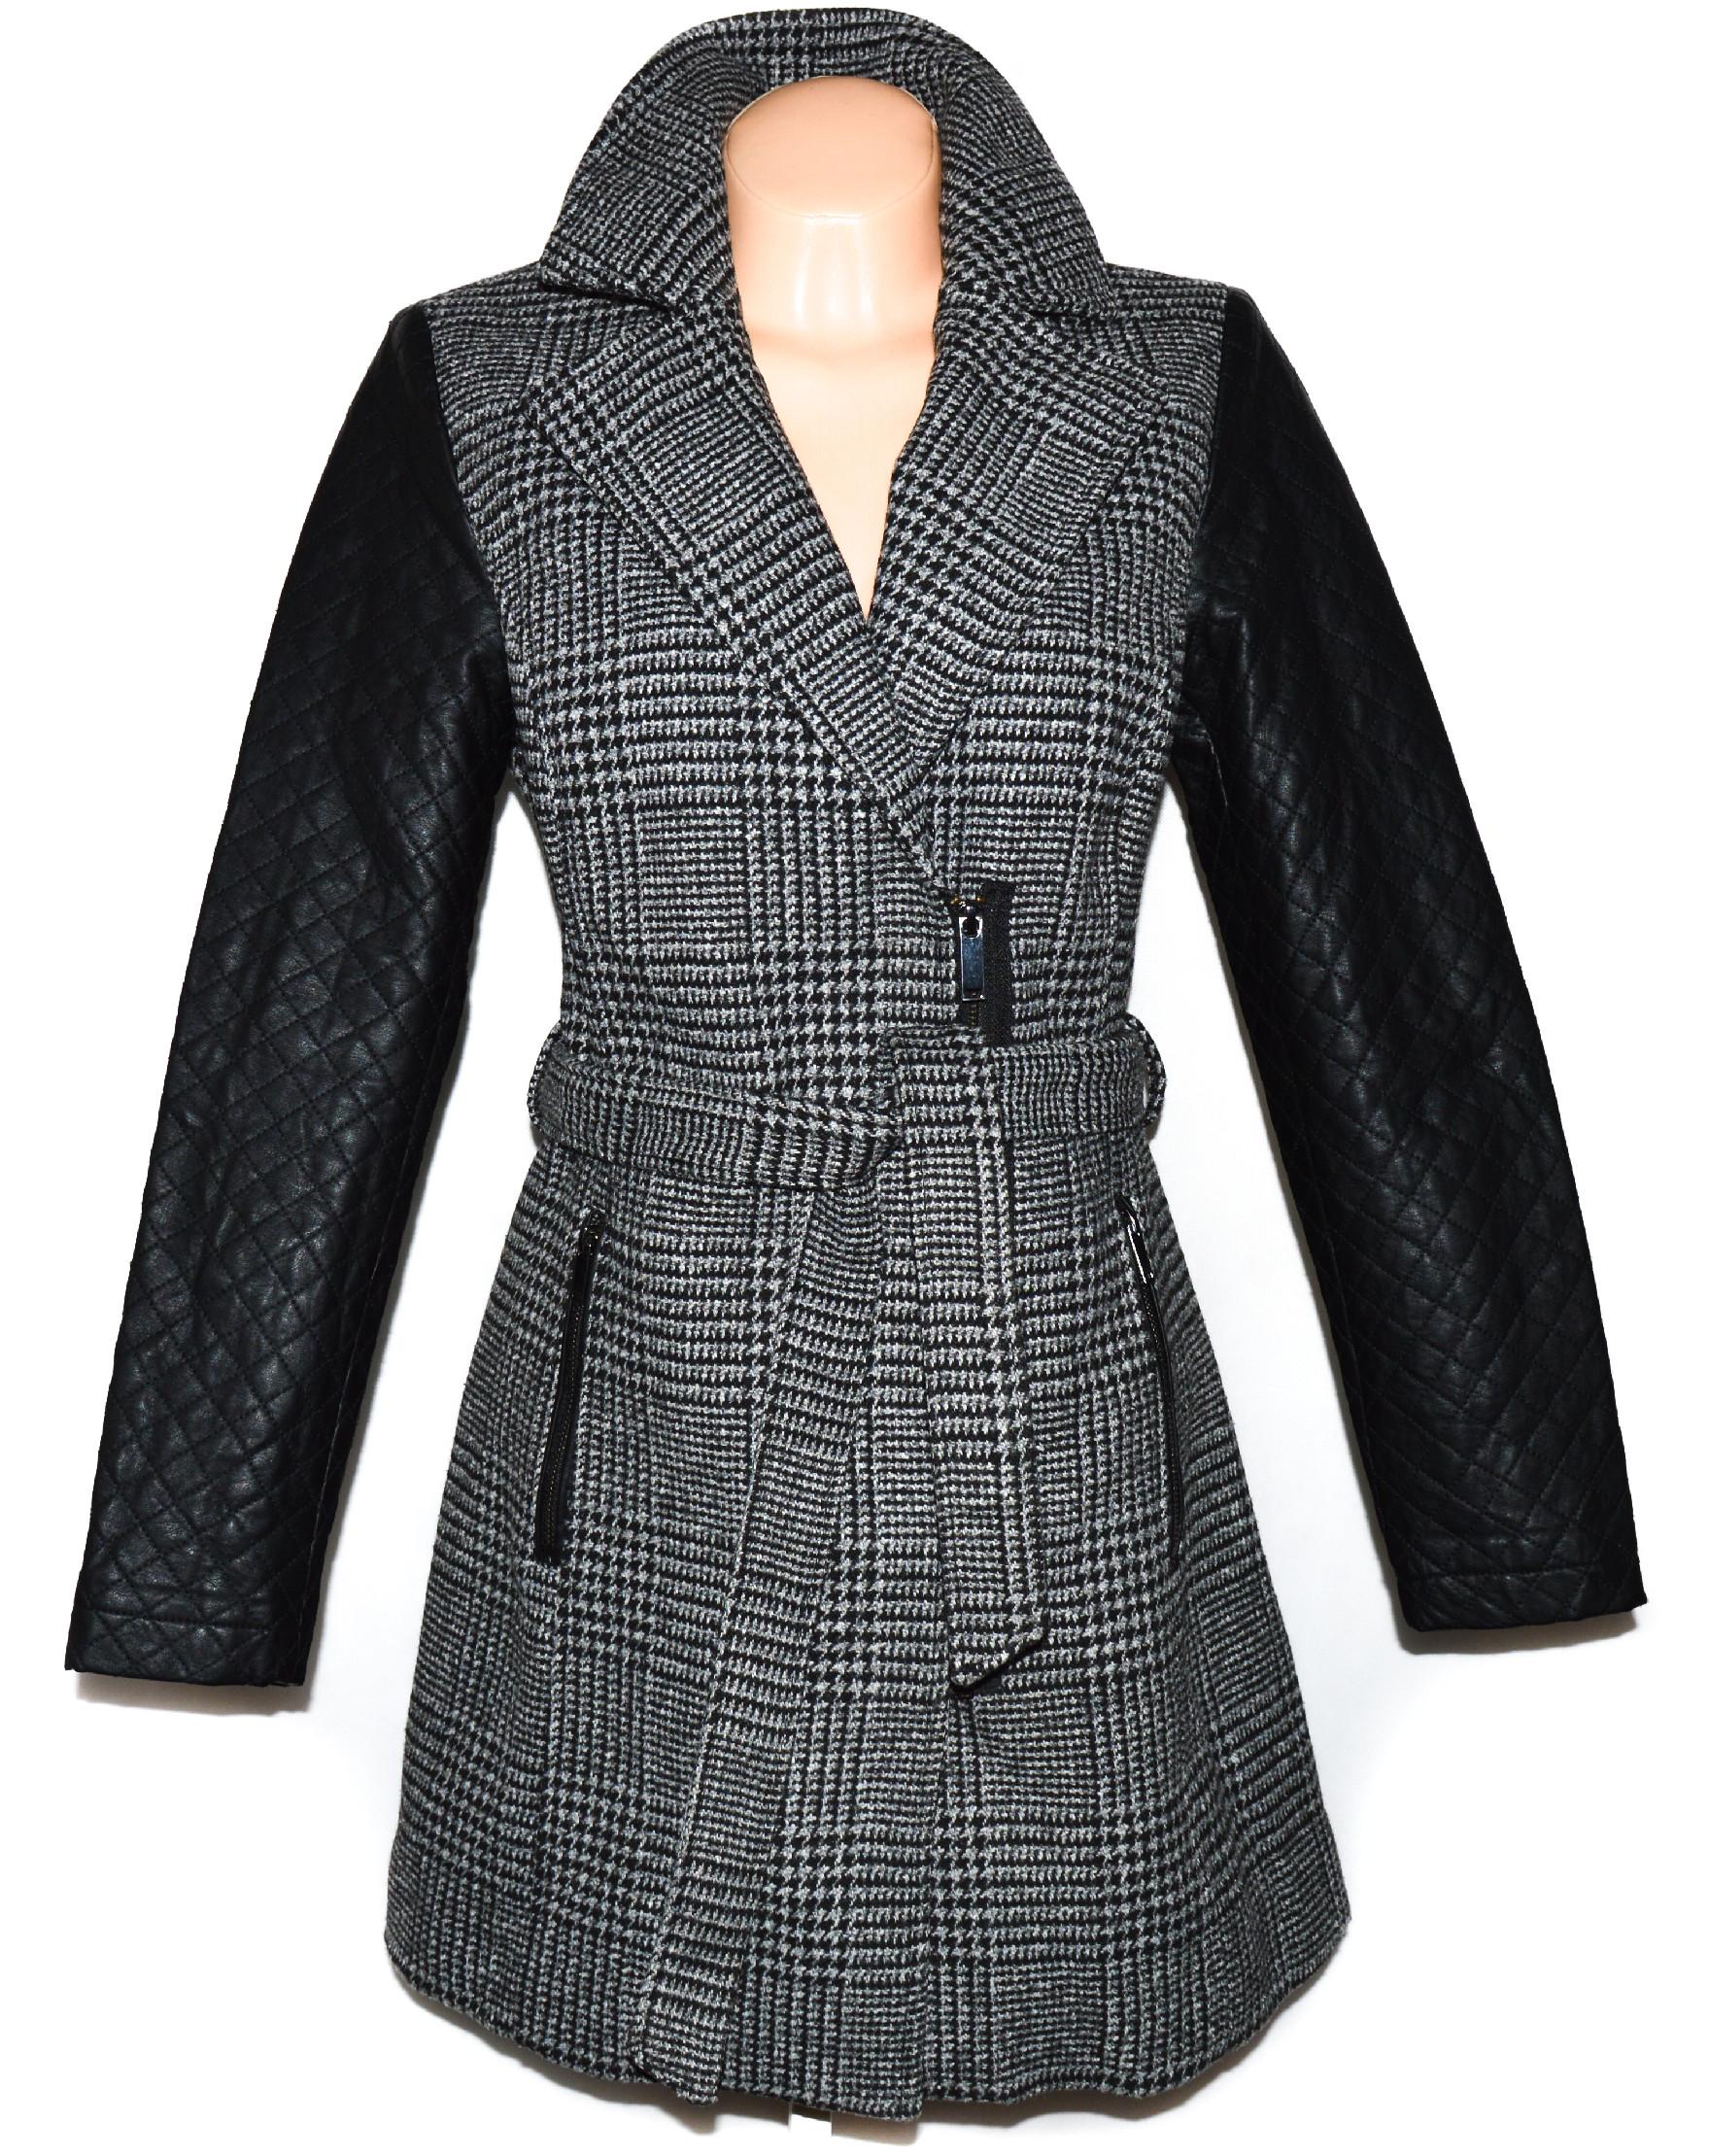 Dámský šedočerný kabát - křivák s koženkovými rukávy C&A XL